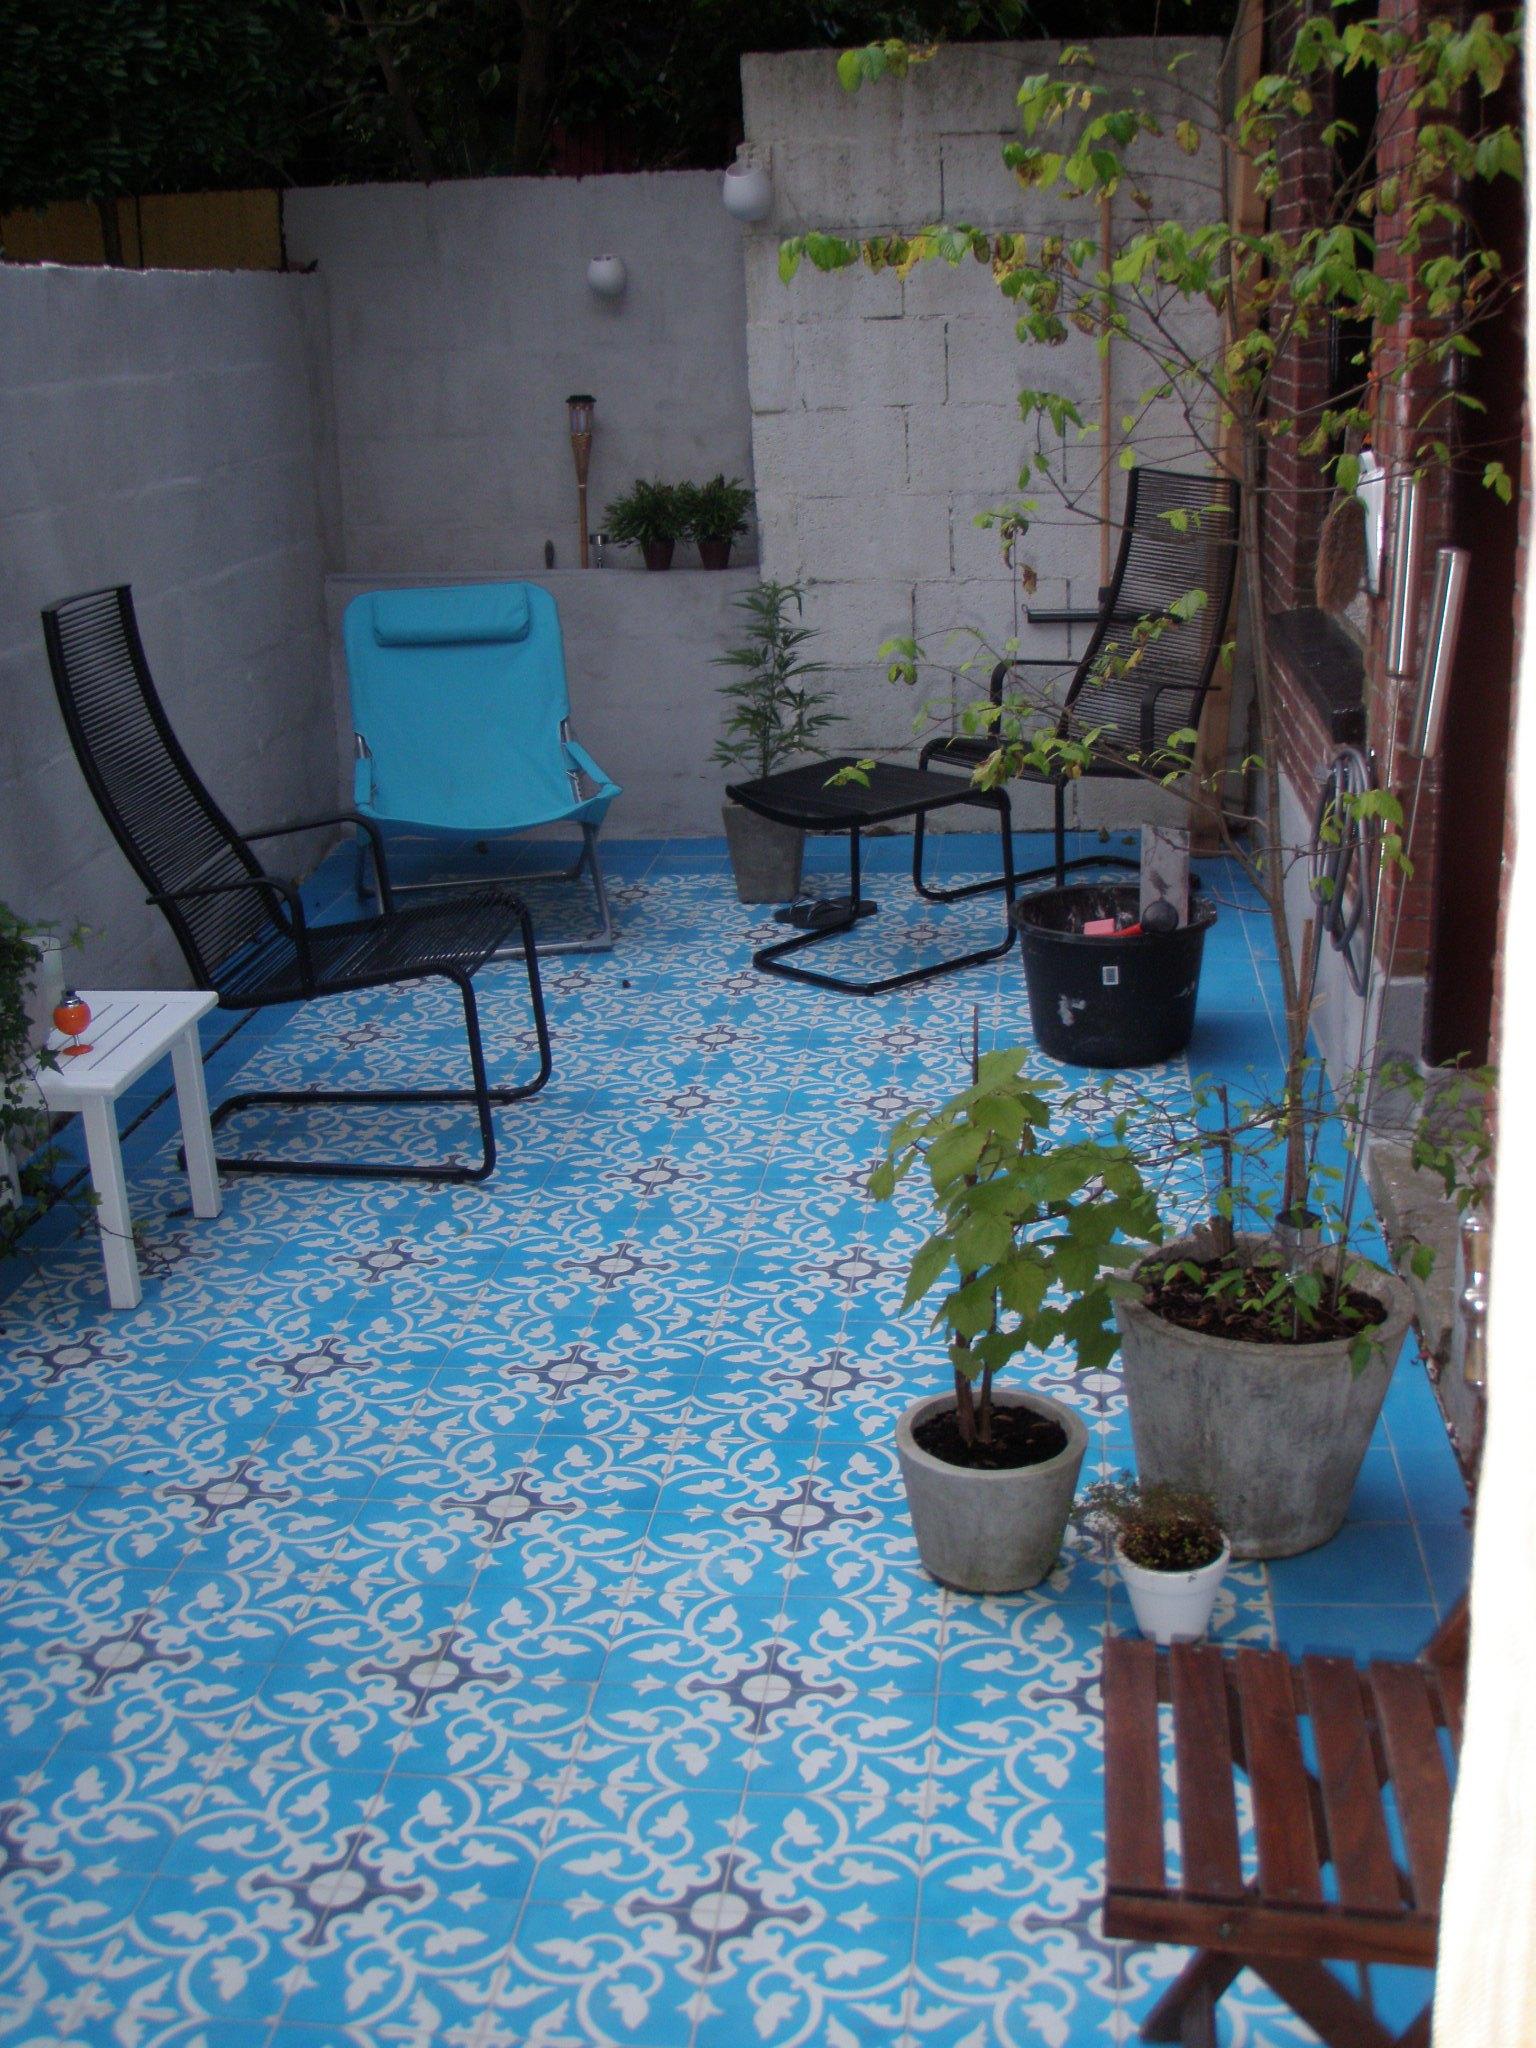 marokko zement fliesen. Black Bedroom Furniture Sets. Home Design Ideas